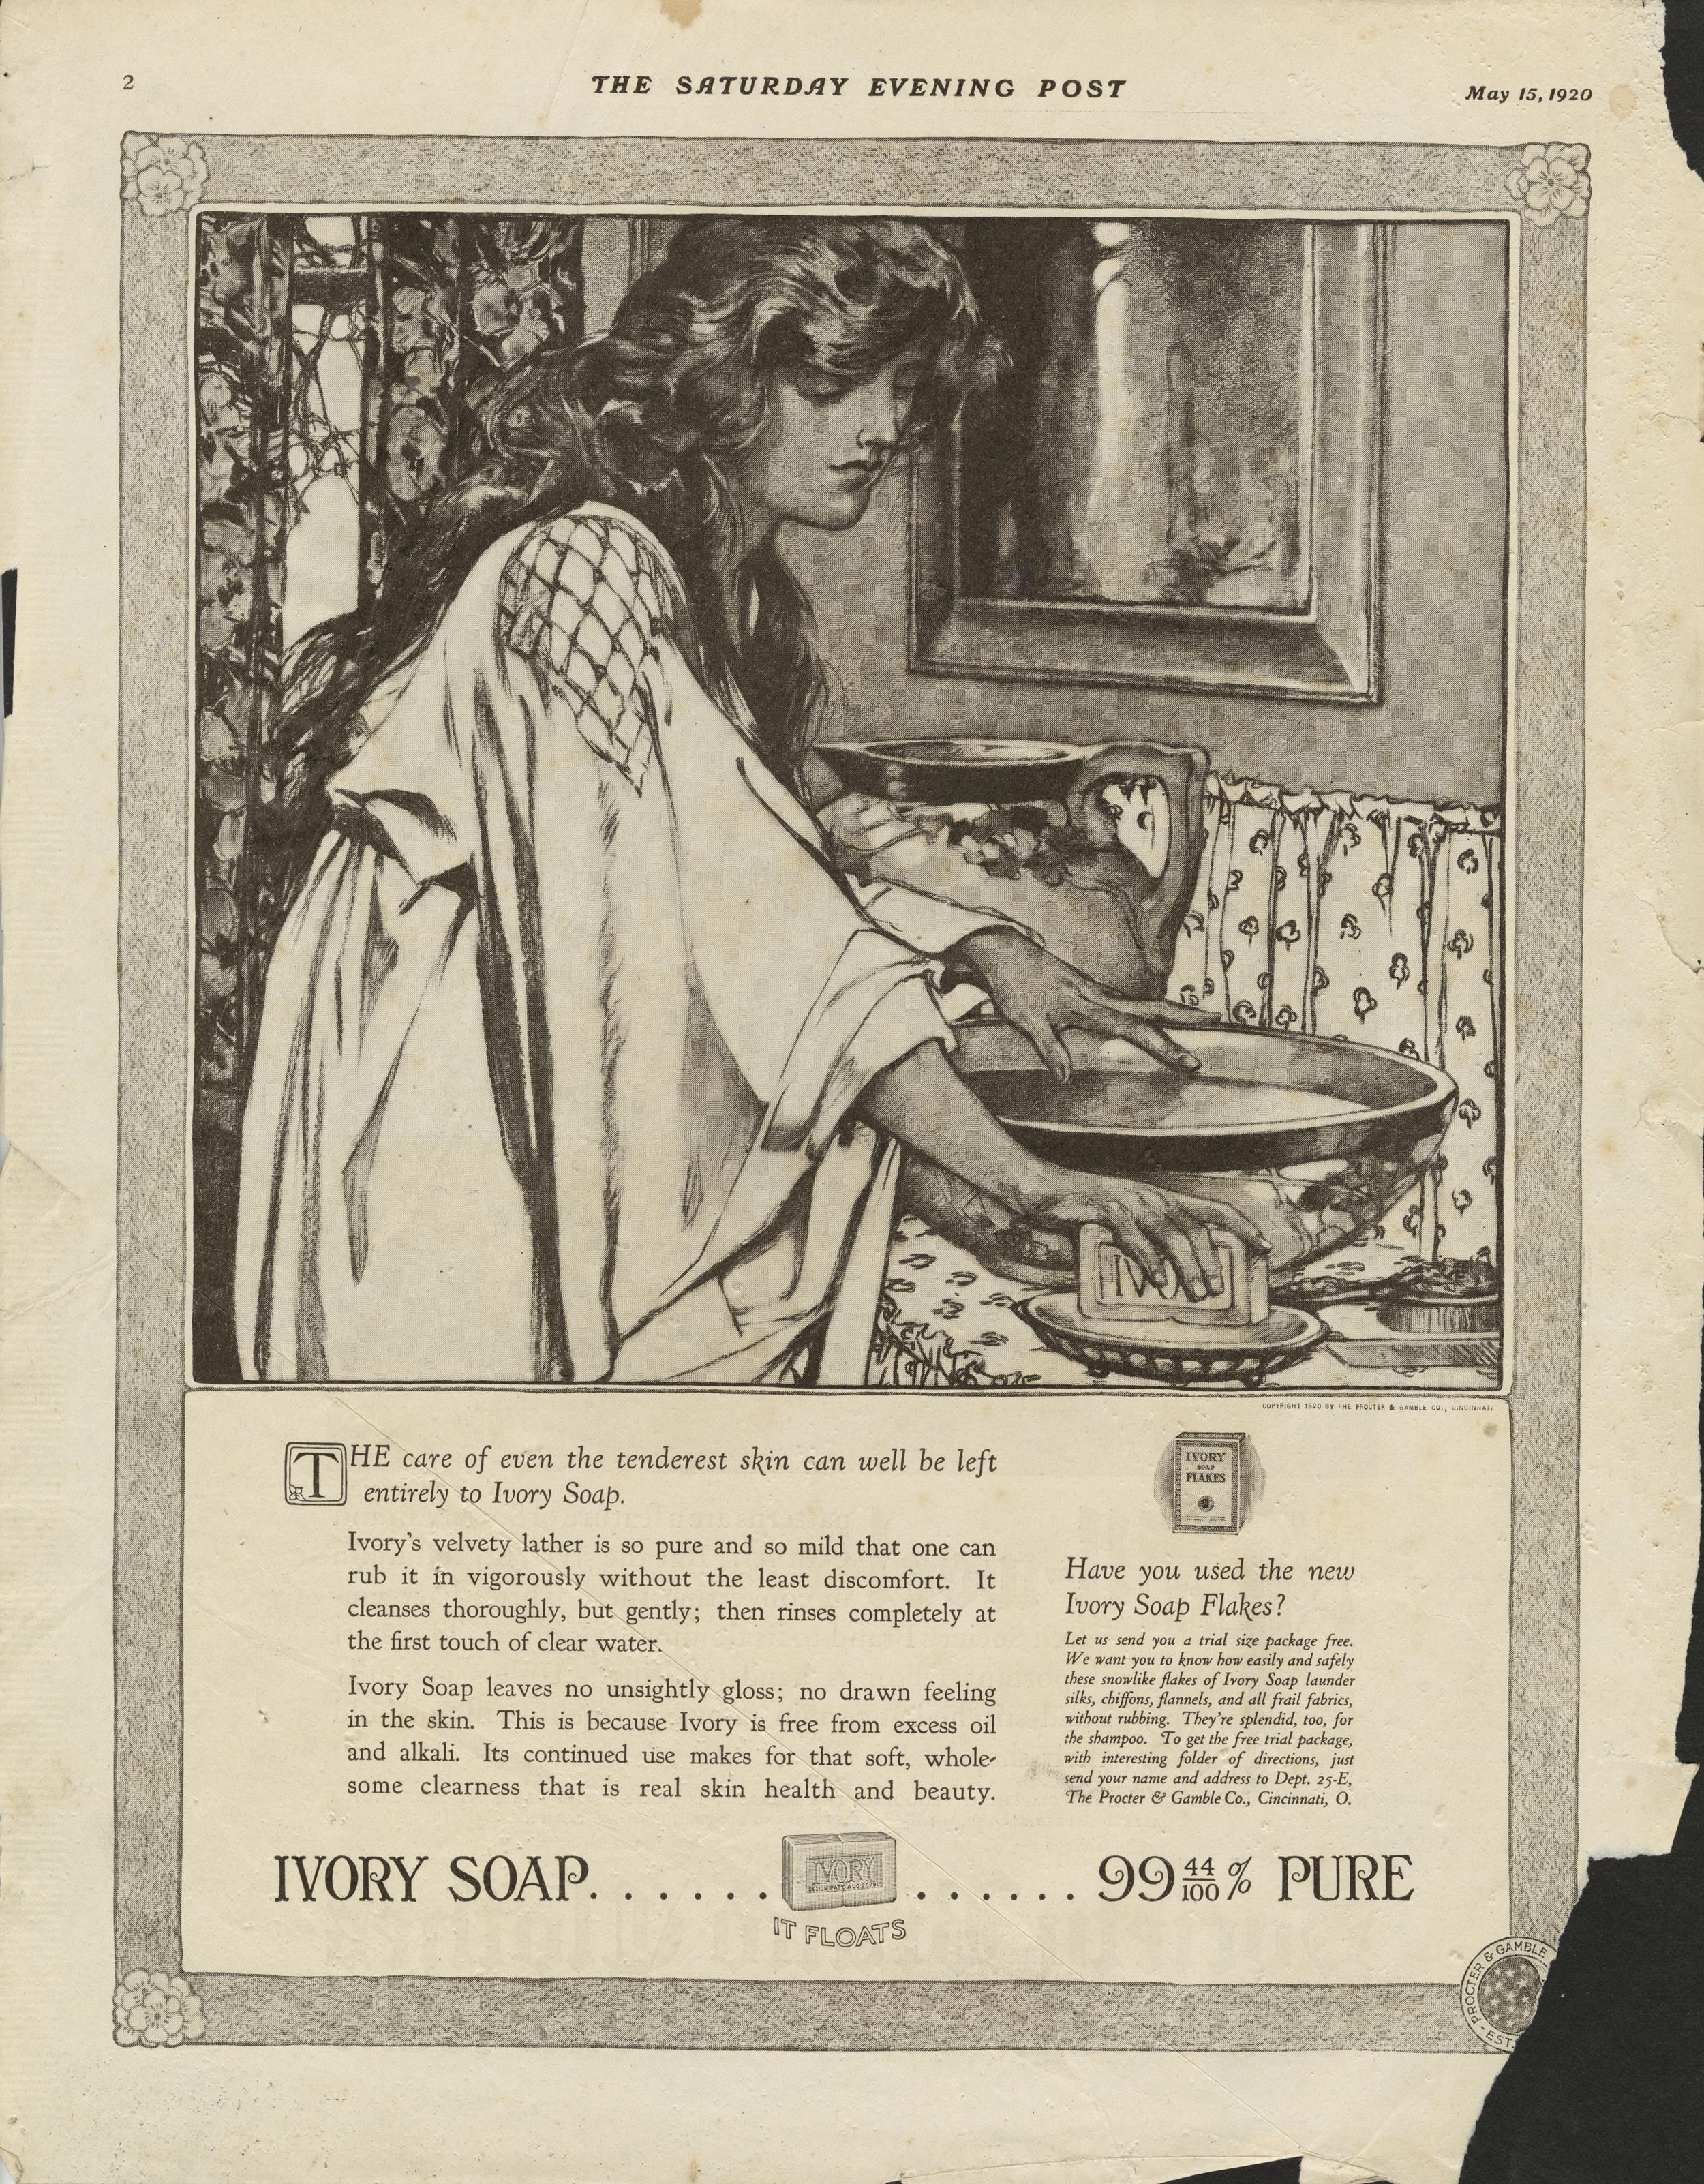 Clara Elsene Peck, Ivory Soap print advertisement. The Saturday Evening Post. May 15, 1920.